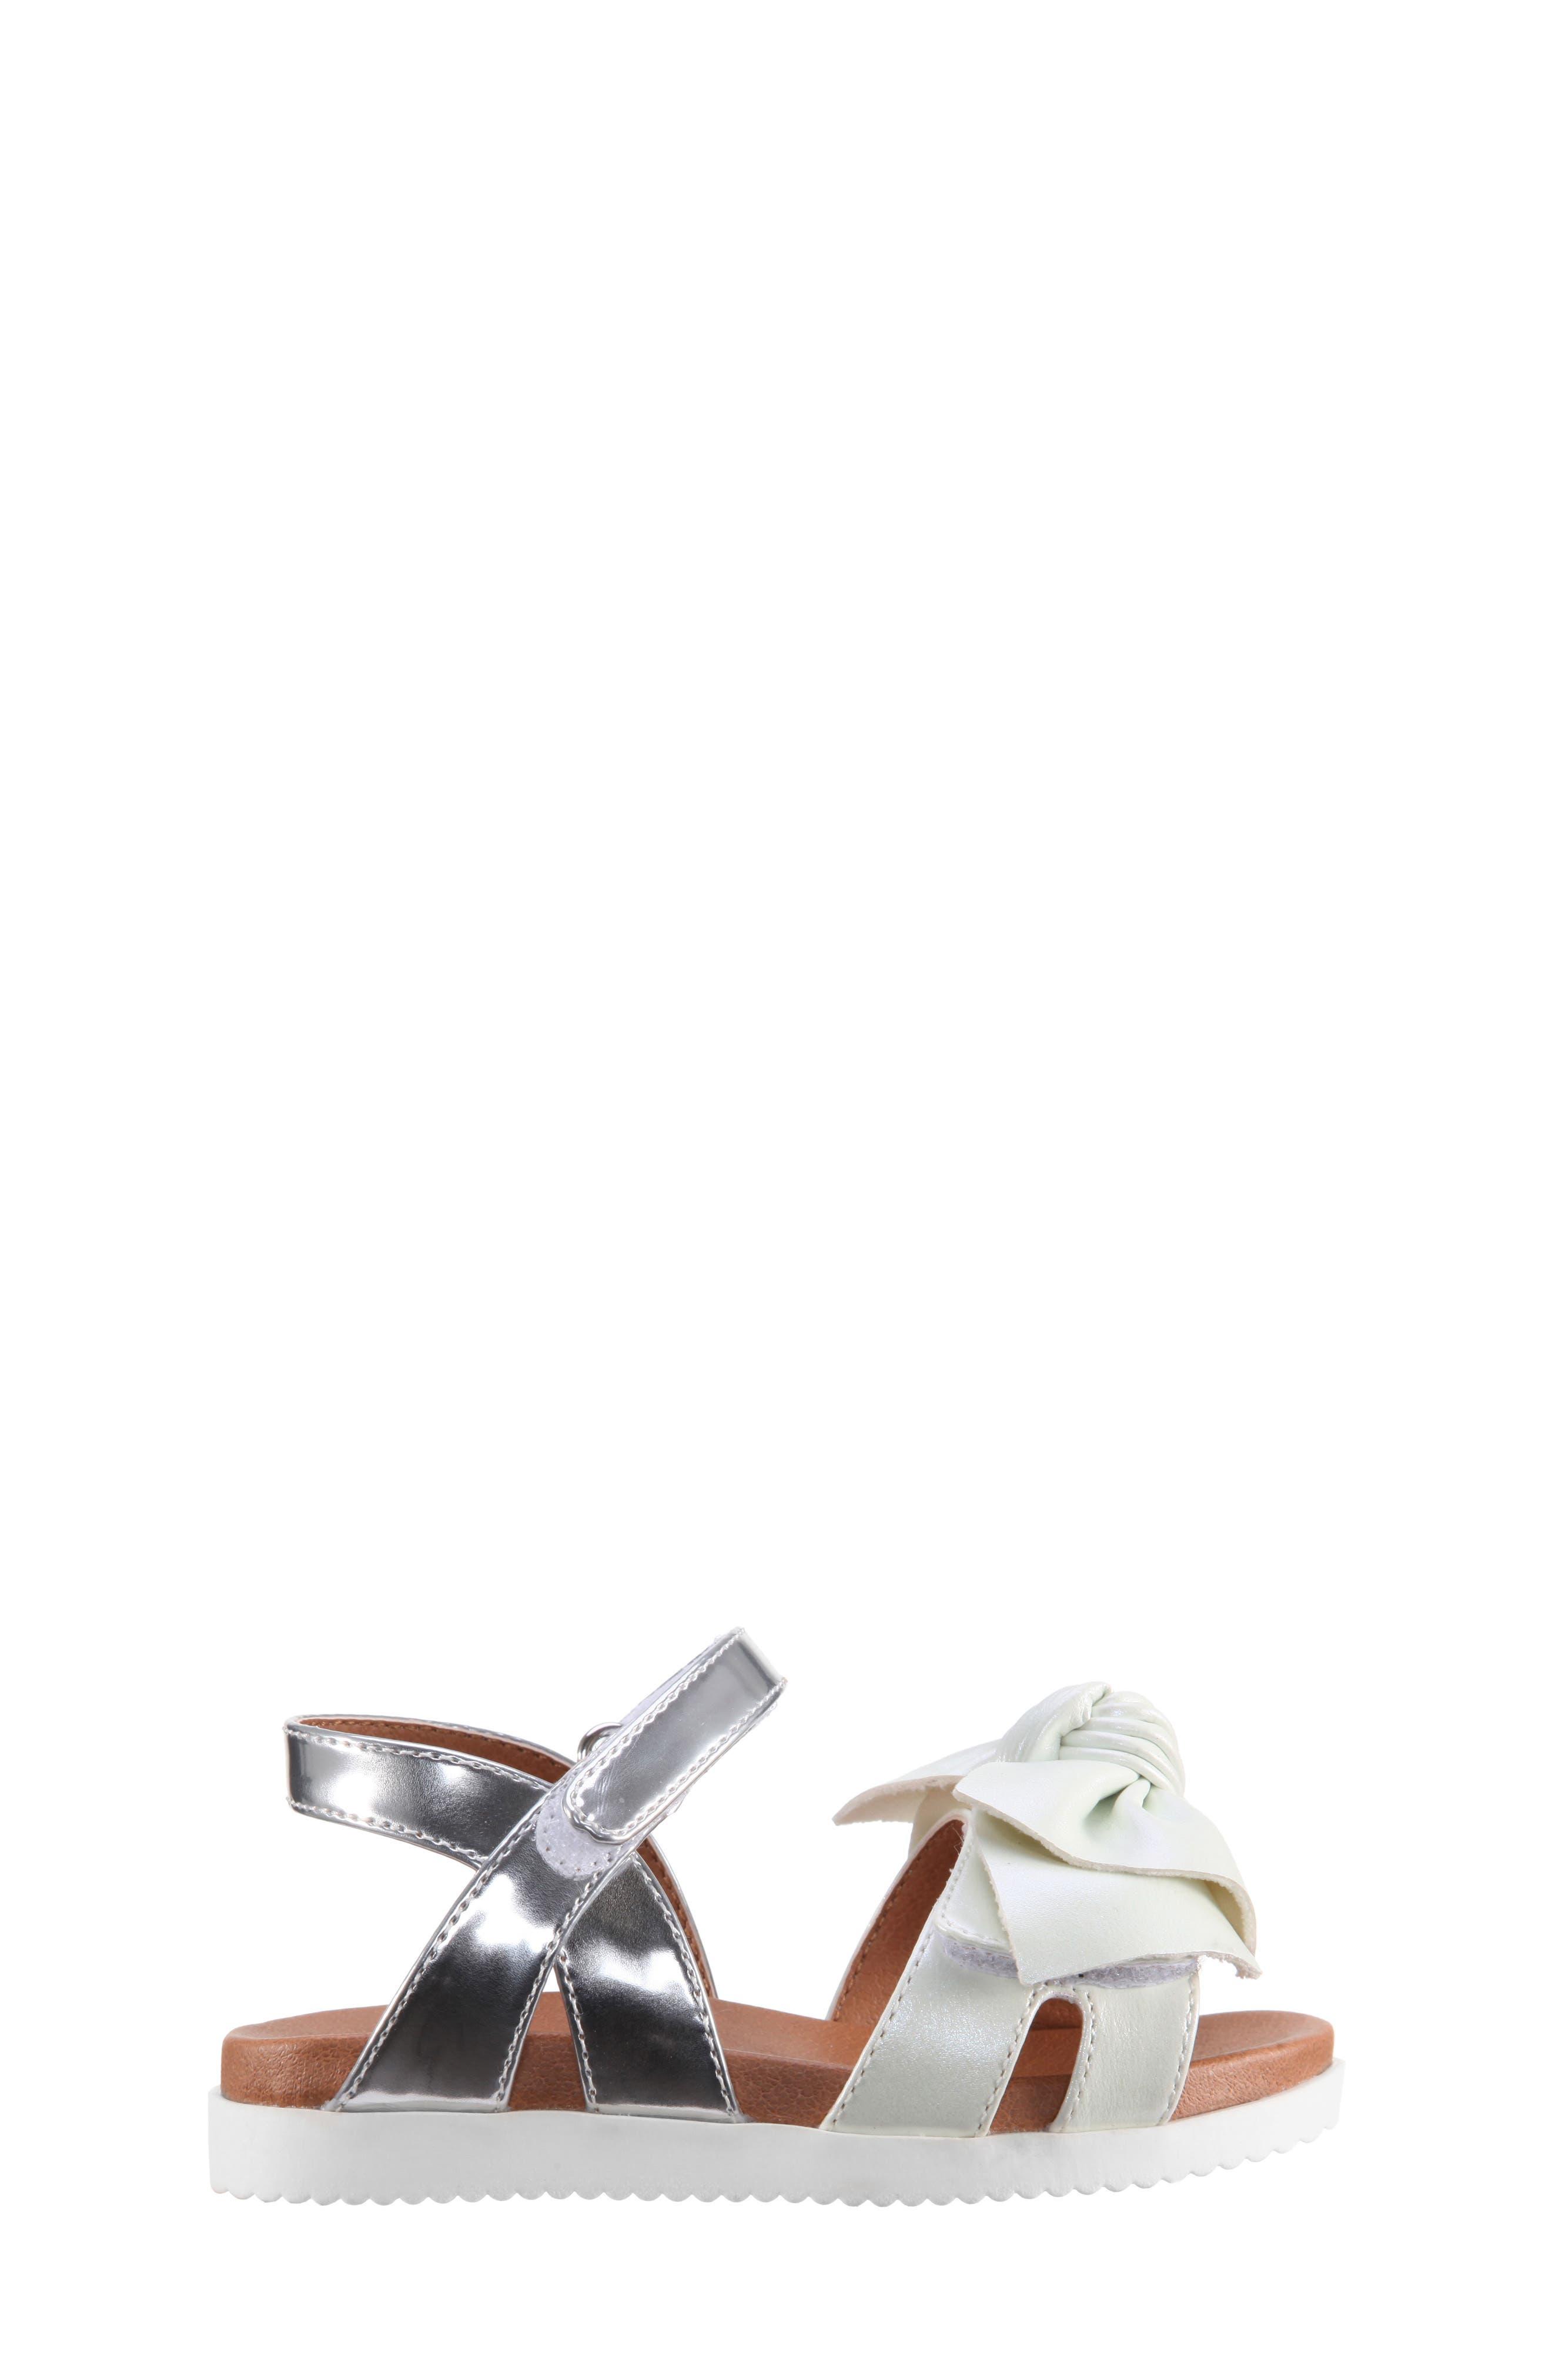 Kaitylyn Bow Sandal,                             Alternate thumbnail 3, color,                             White Metallic/ Silver